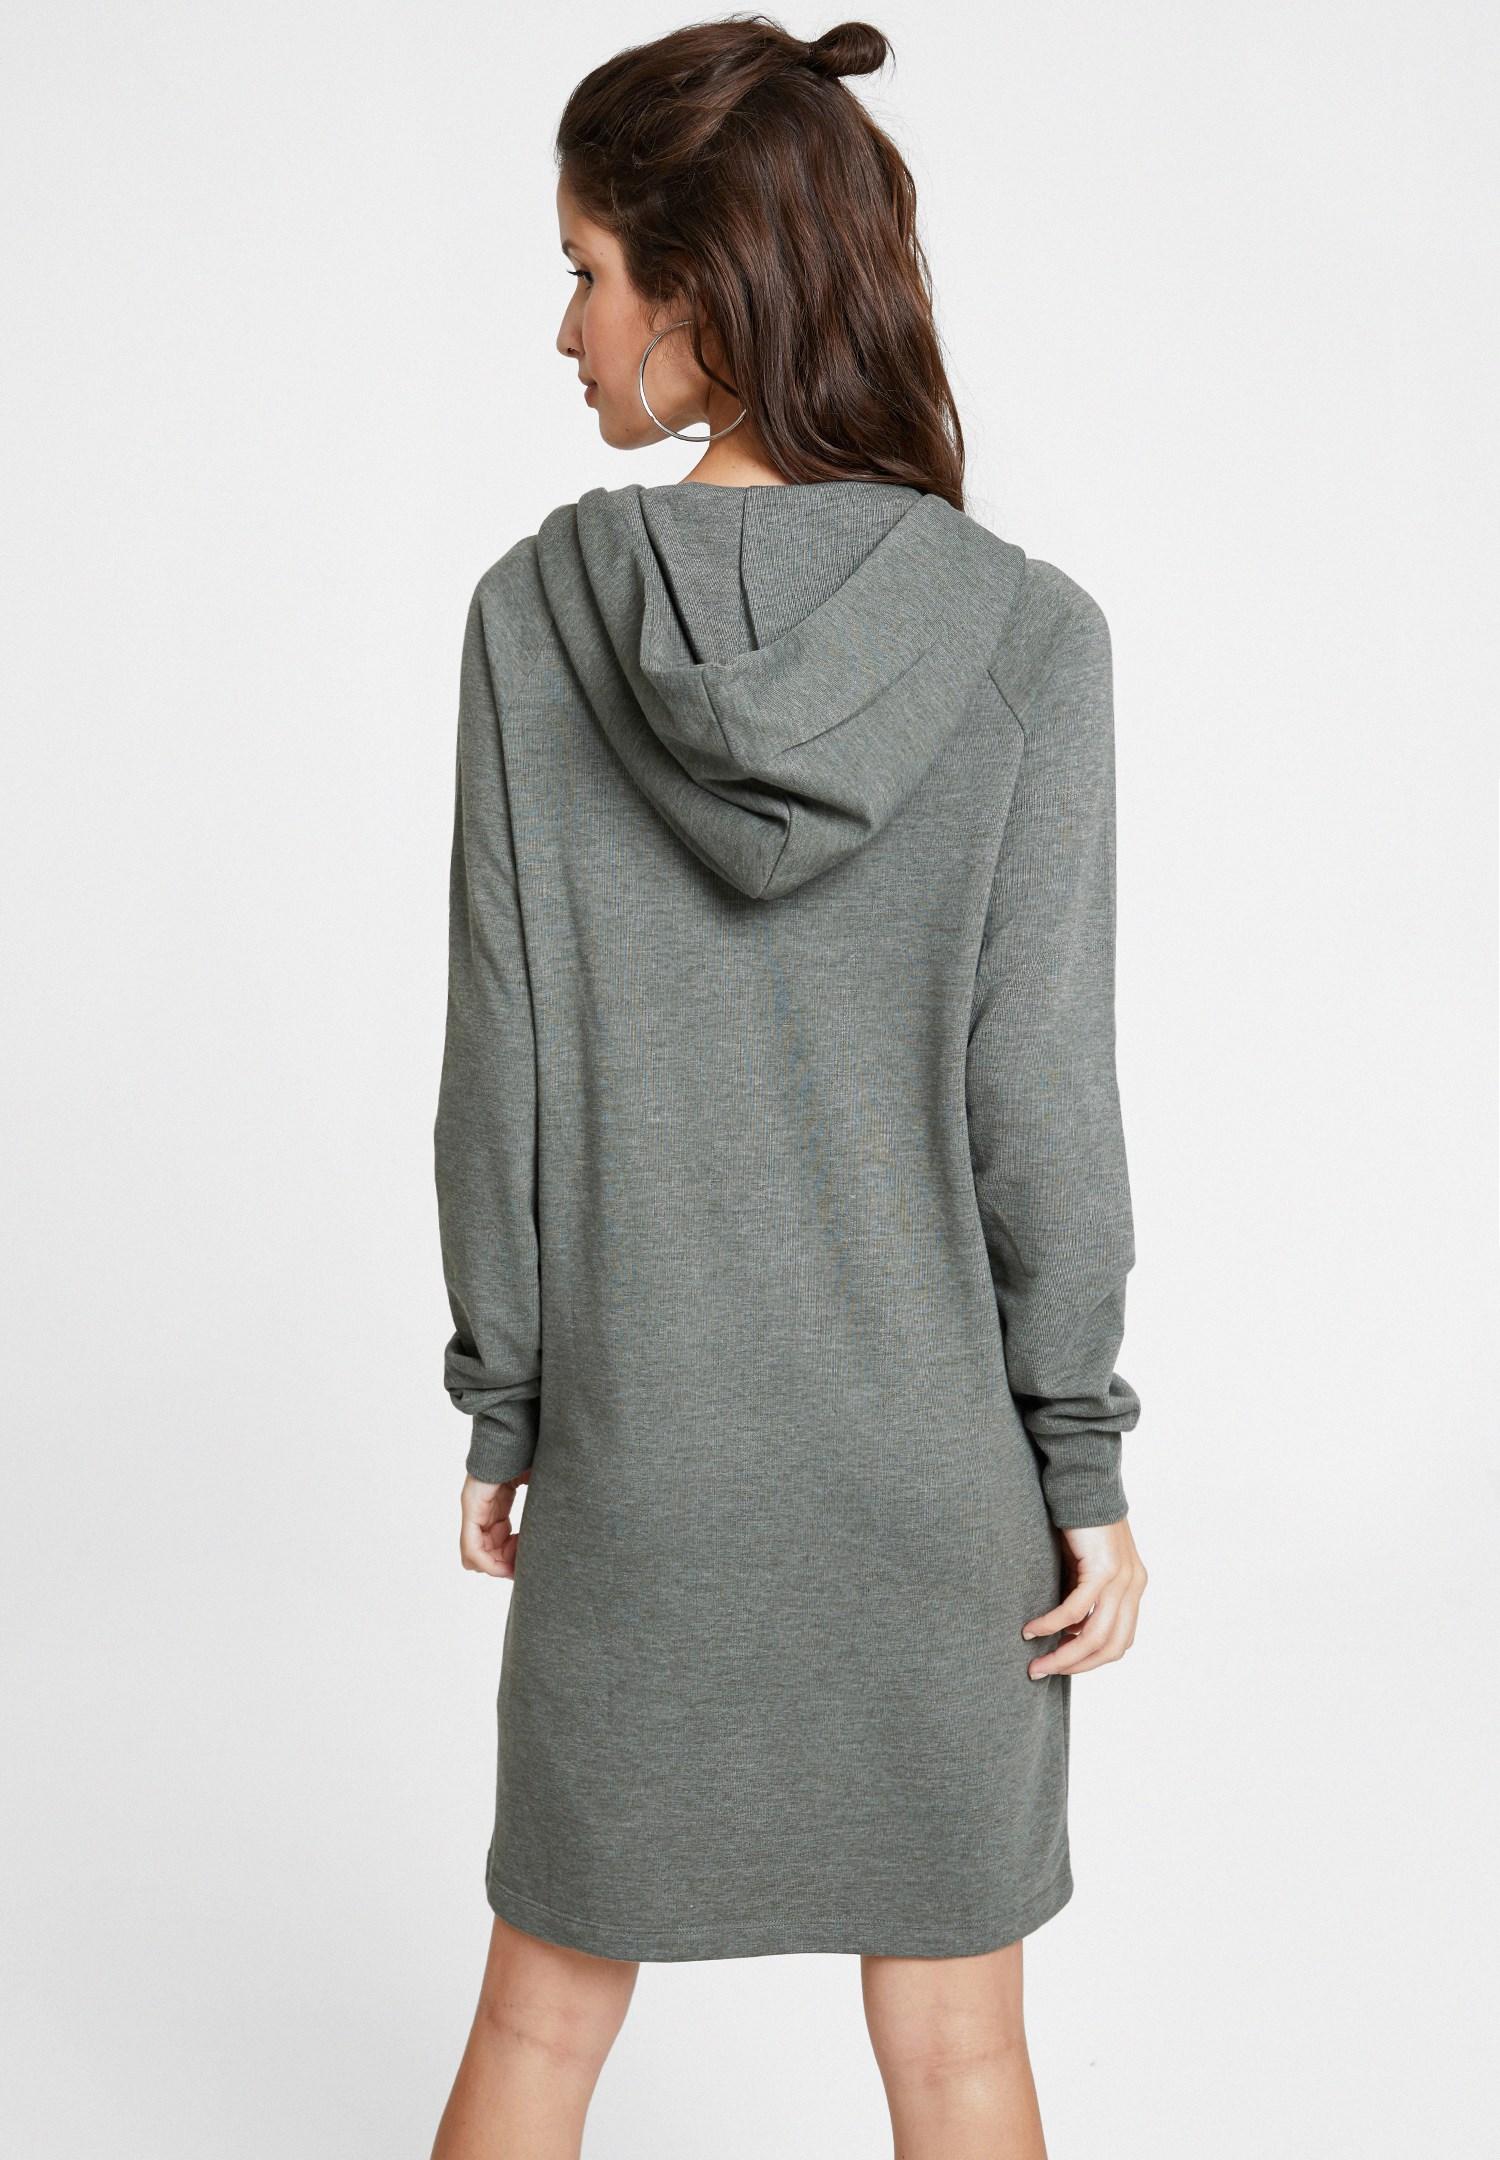 Bayan Yeşil İp Detaylı Kapüşonlu Elbise